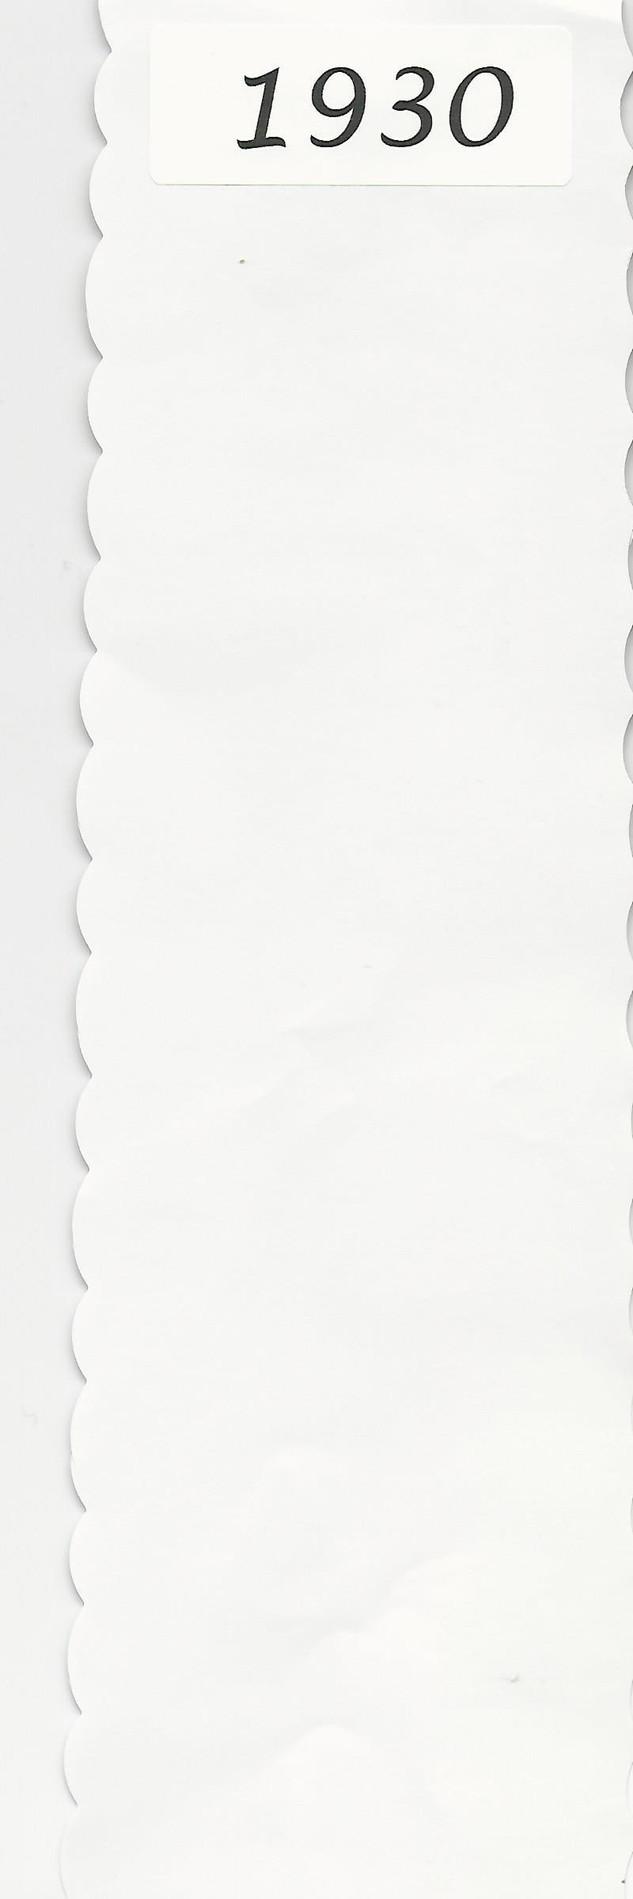 1930 to933001